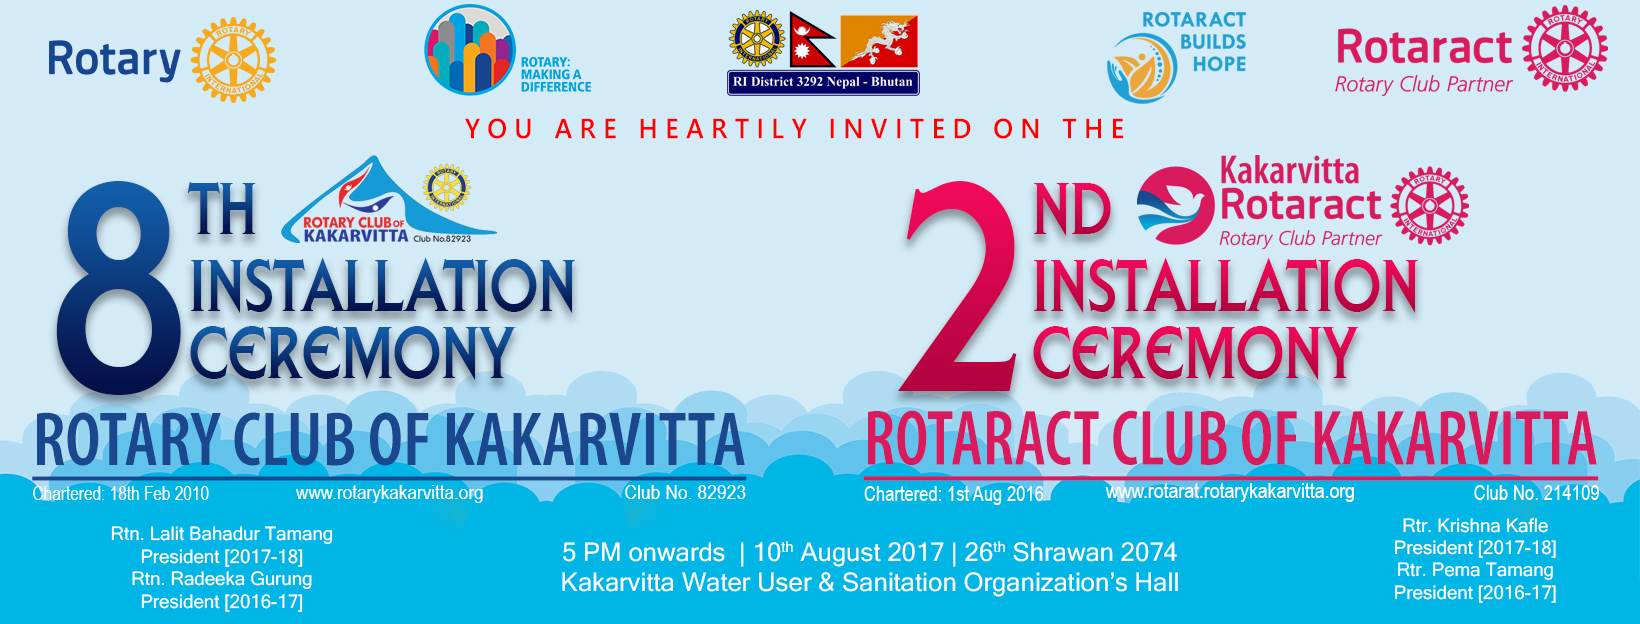 8th-Installation-Ceremony-Rotary-Club-of-Kakarvitta-0